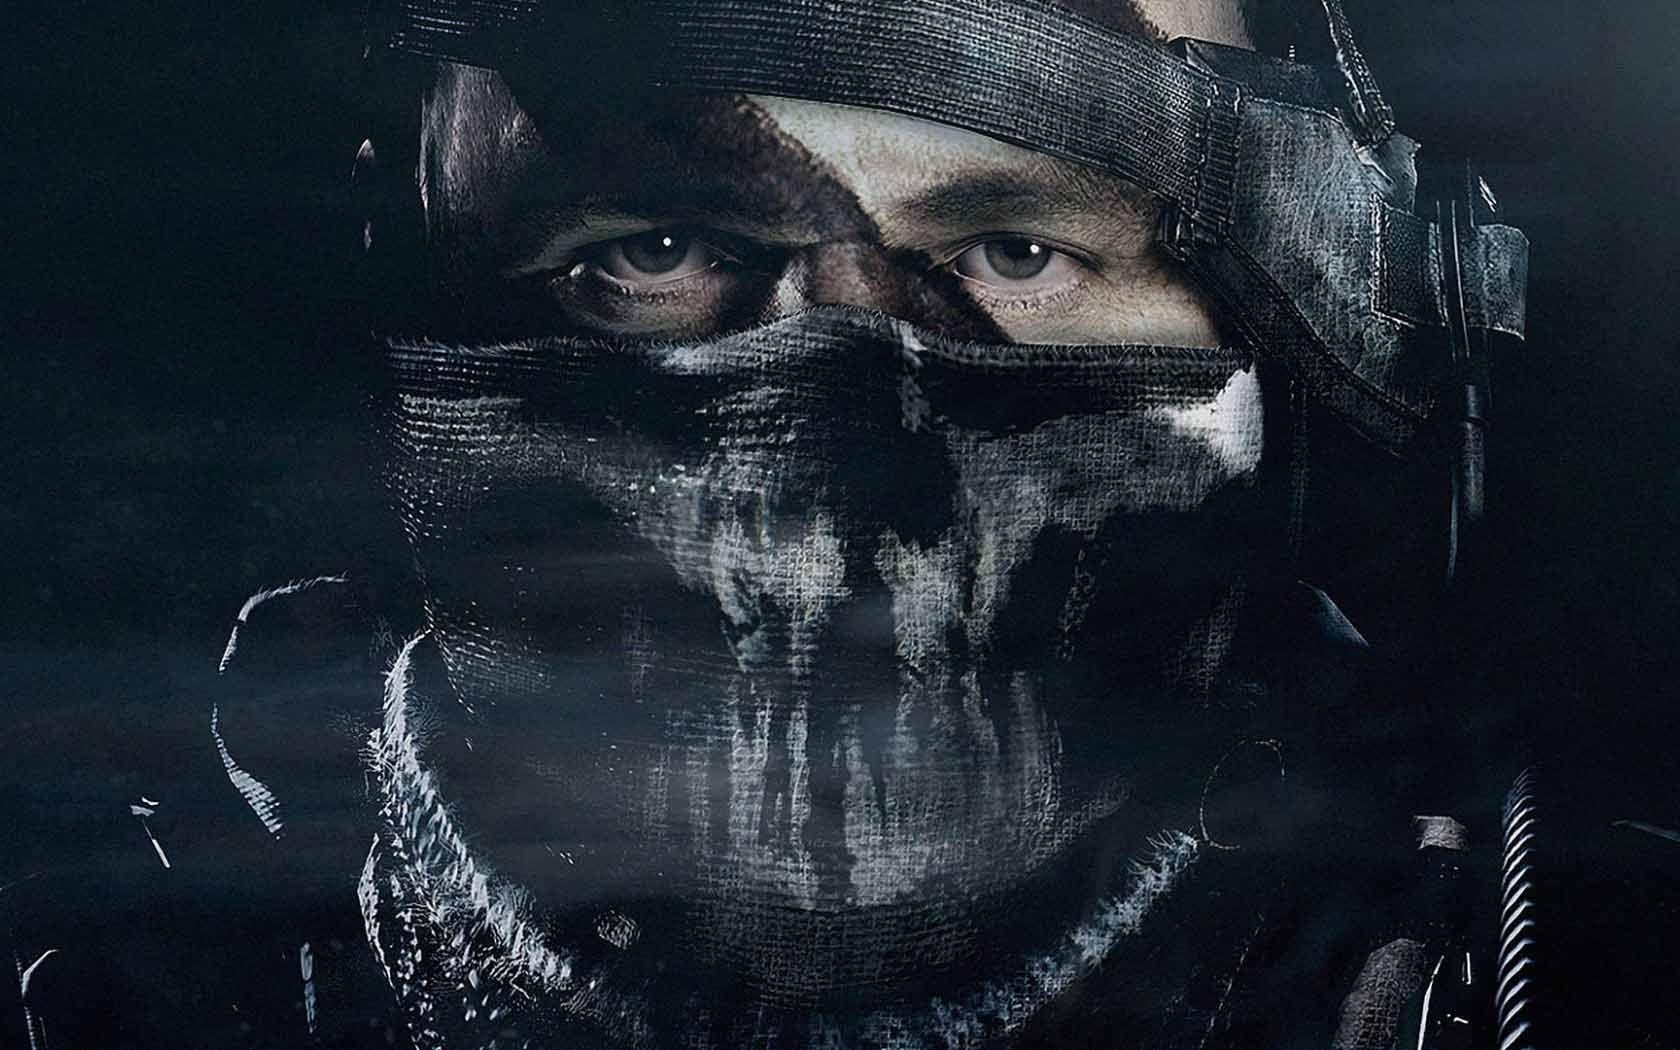 Call Of Duty Ghosts Wallpaper 36 Wallpaper Background Hd Call Of Duty Ghosts Call Of Duty Ghost Soldiers